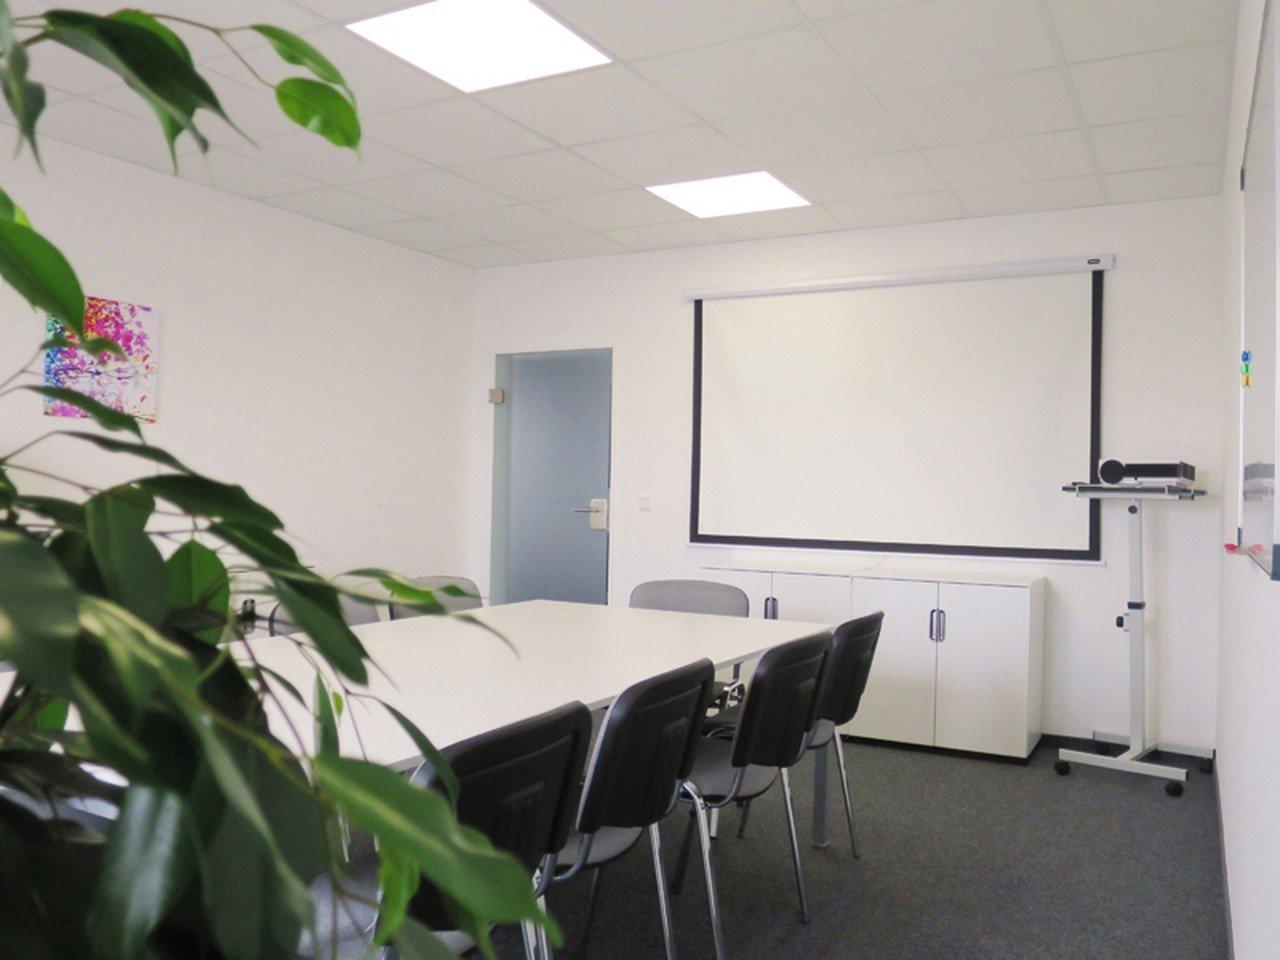 Köln Besprechungsräume Meetingraum Moderner Meeting-/ Konferenzraum in Köln in Flughafen Nähe image 0